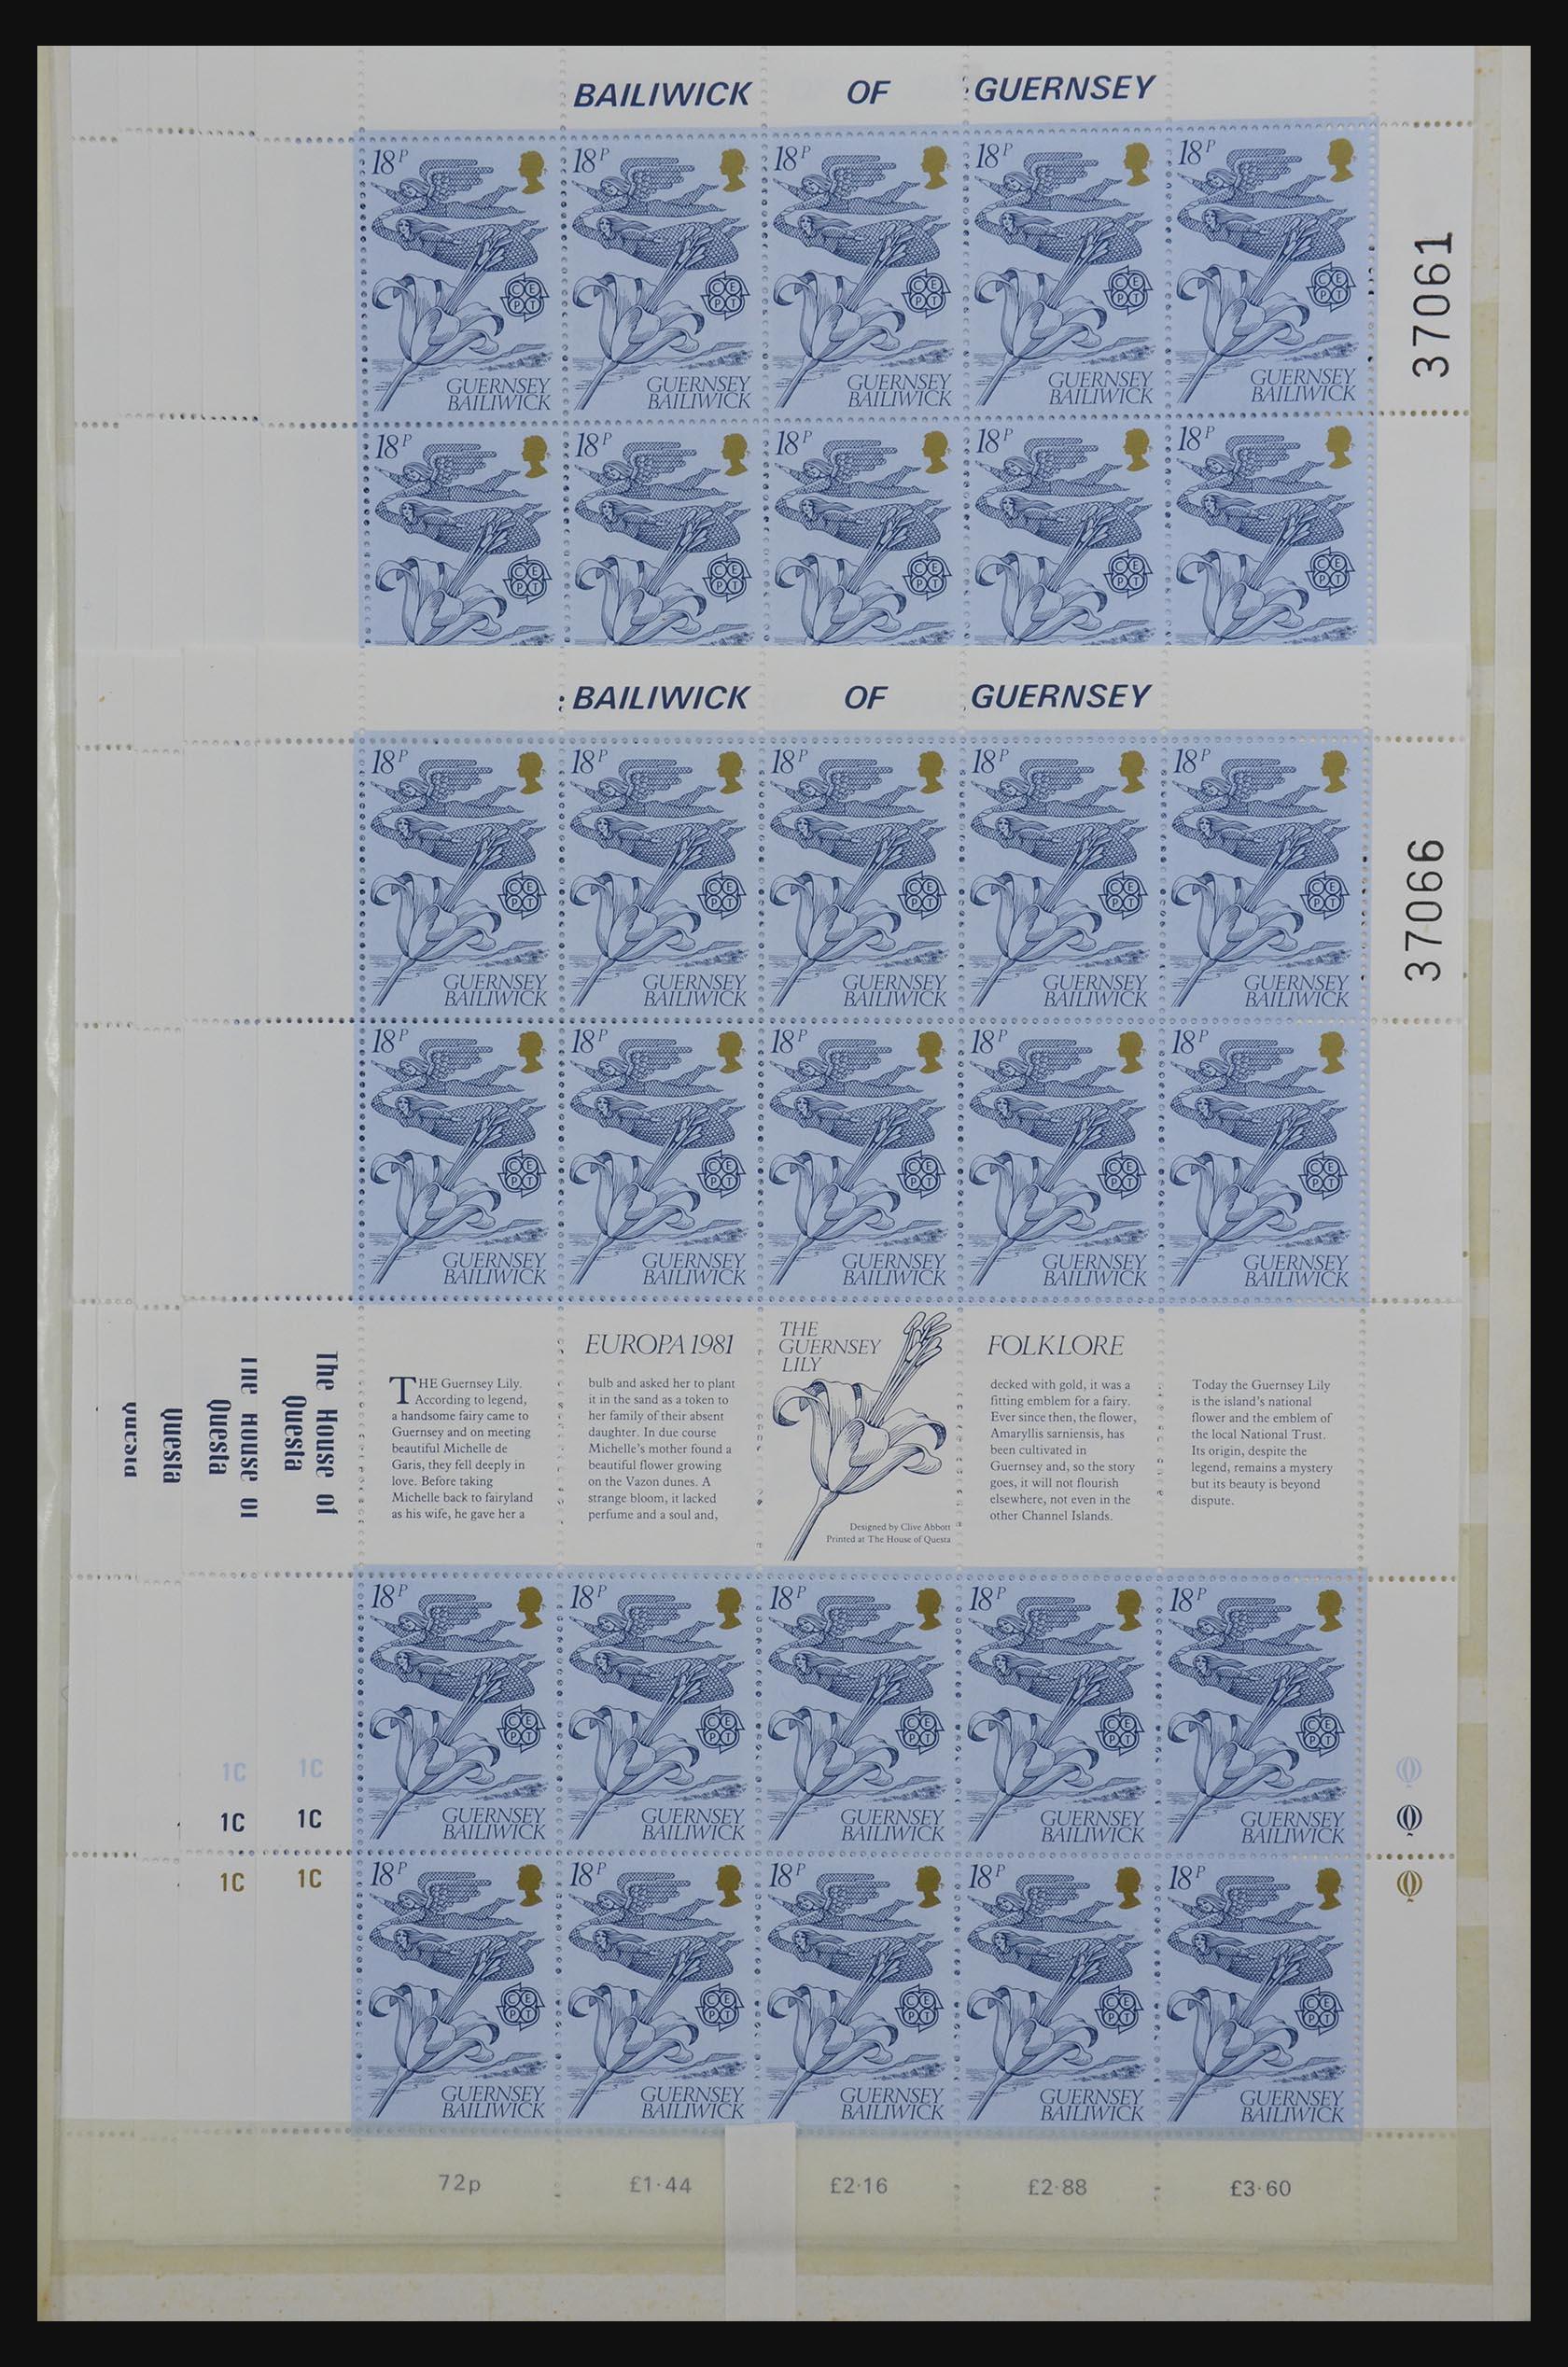 32180 015 - 32180 Guernsey 1972-1992.